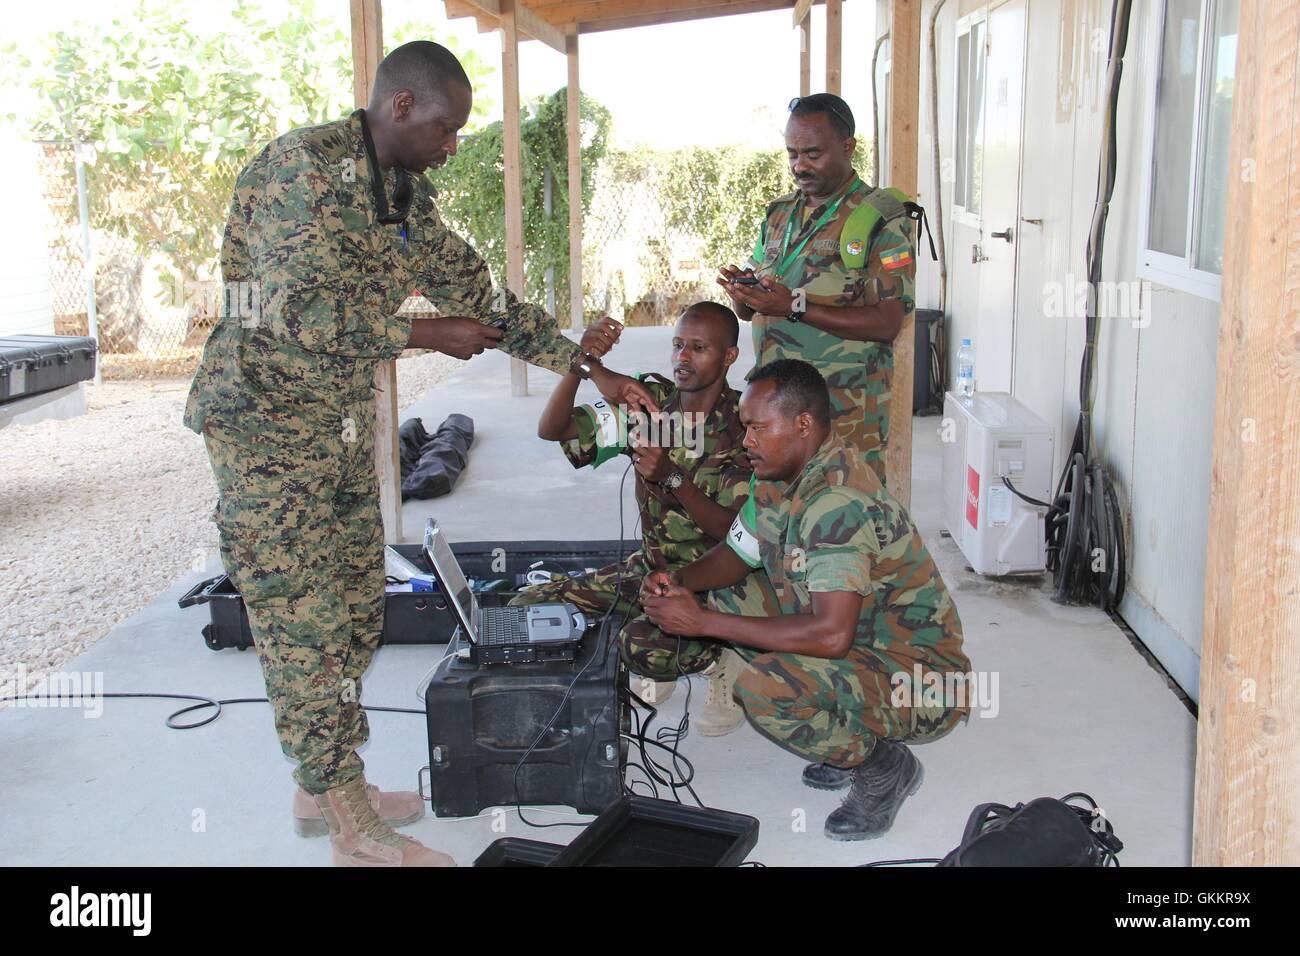 AMISOM Public Information Officers (PIOs) practice during a radio communication training held in Mogadishu, Somalia Stock Photo